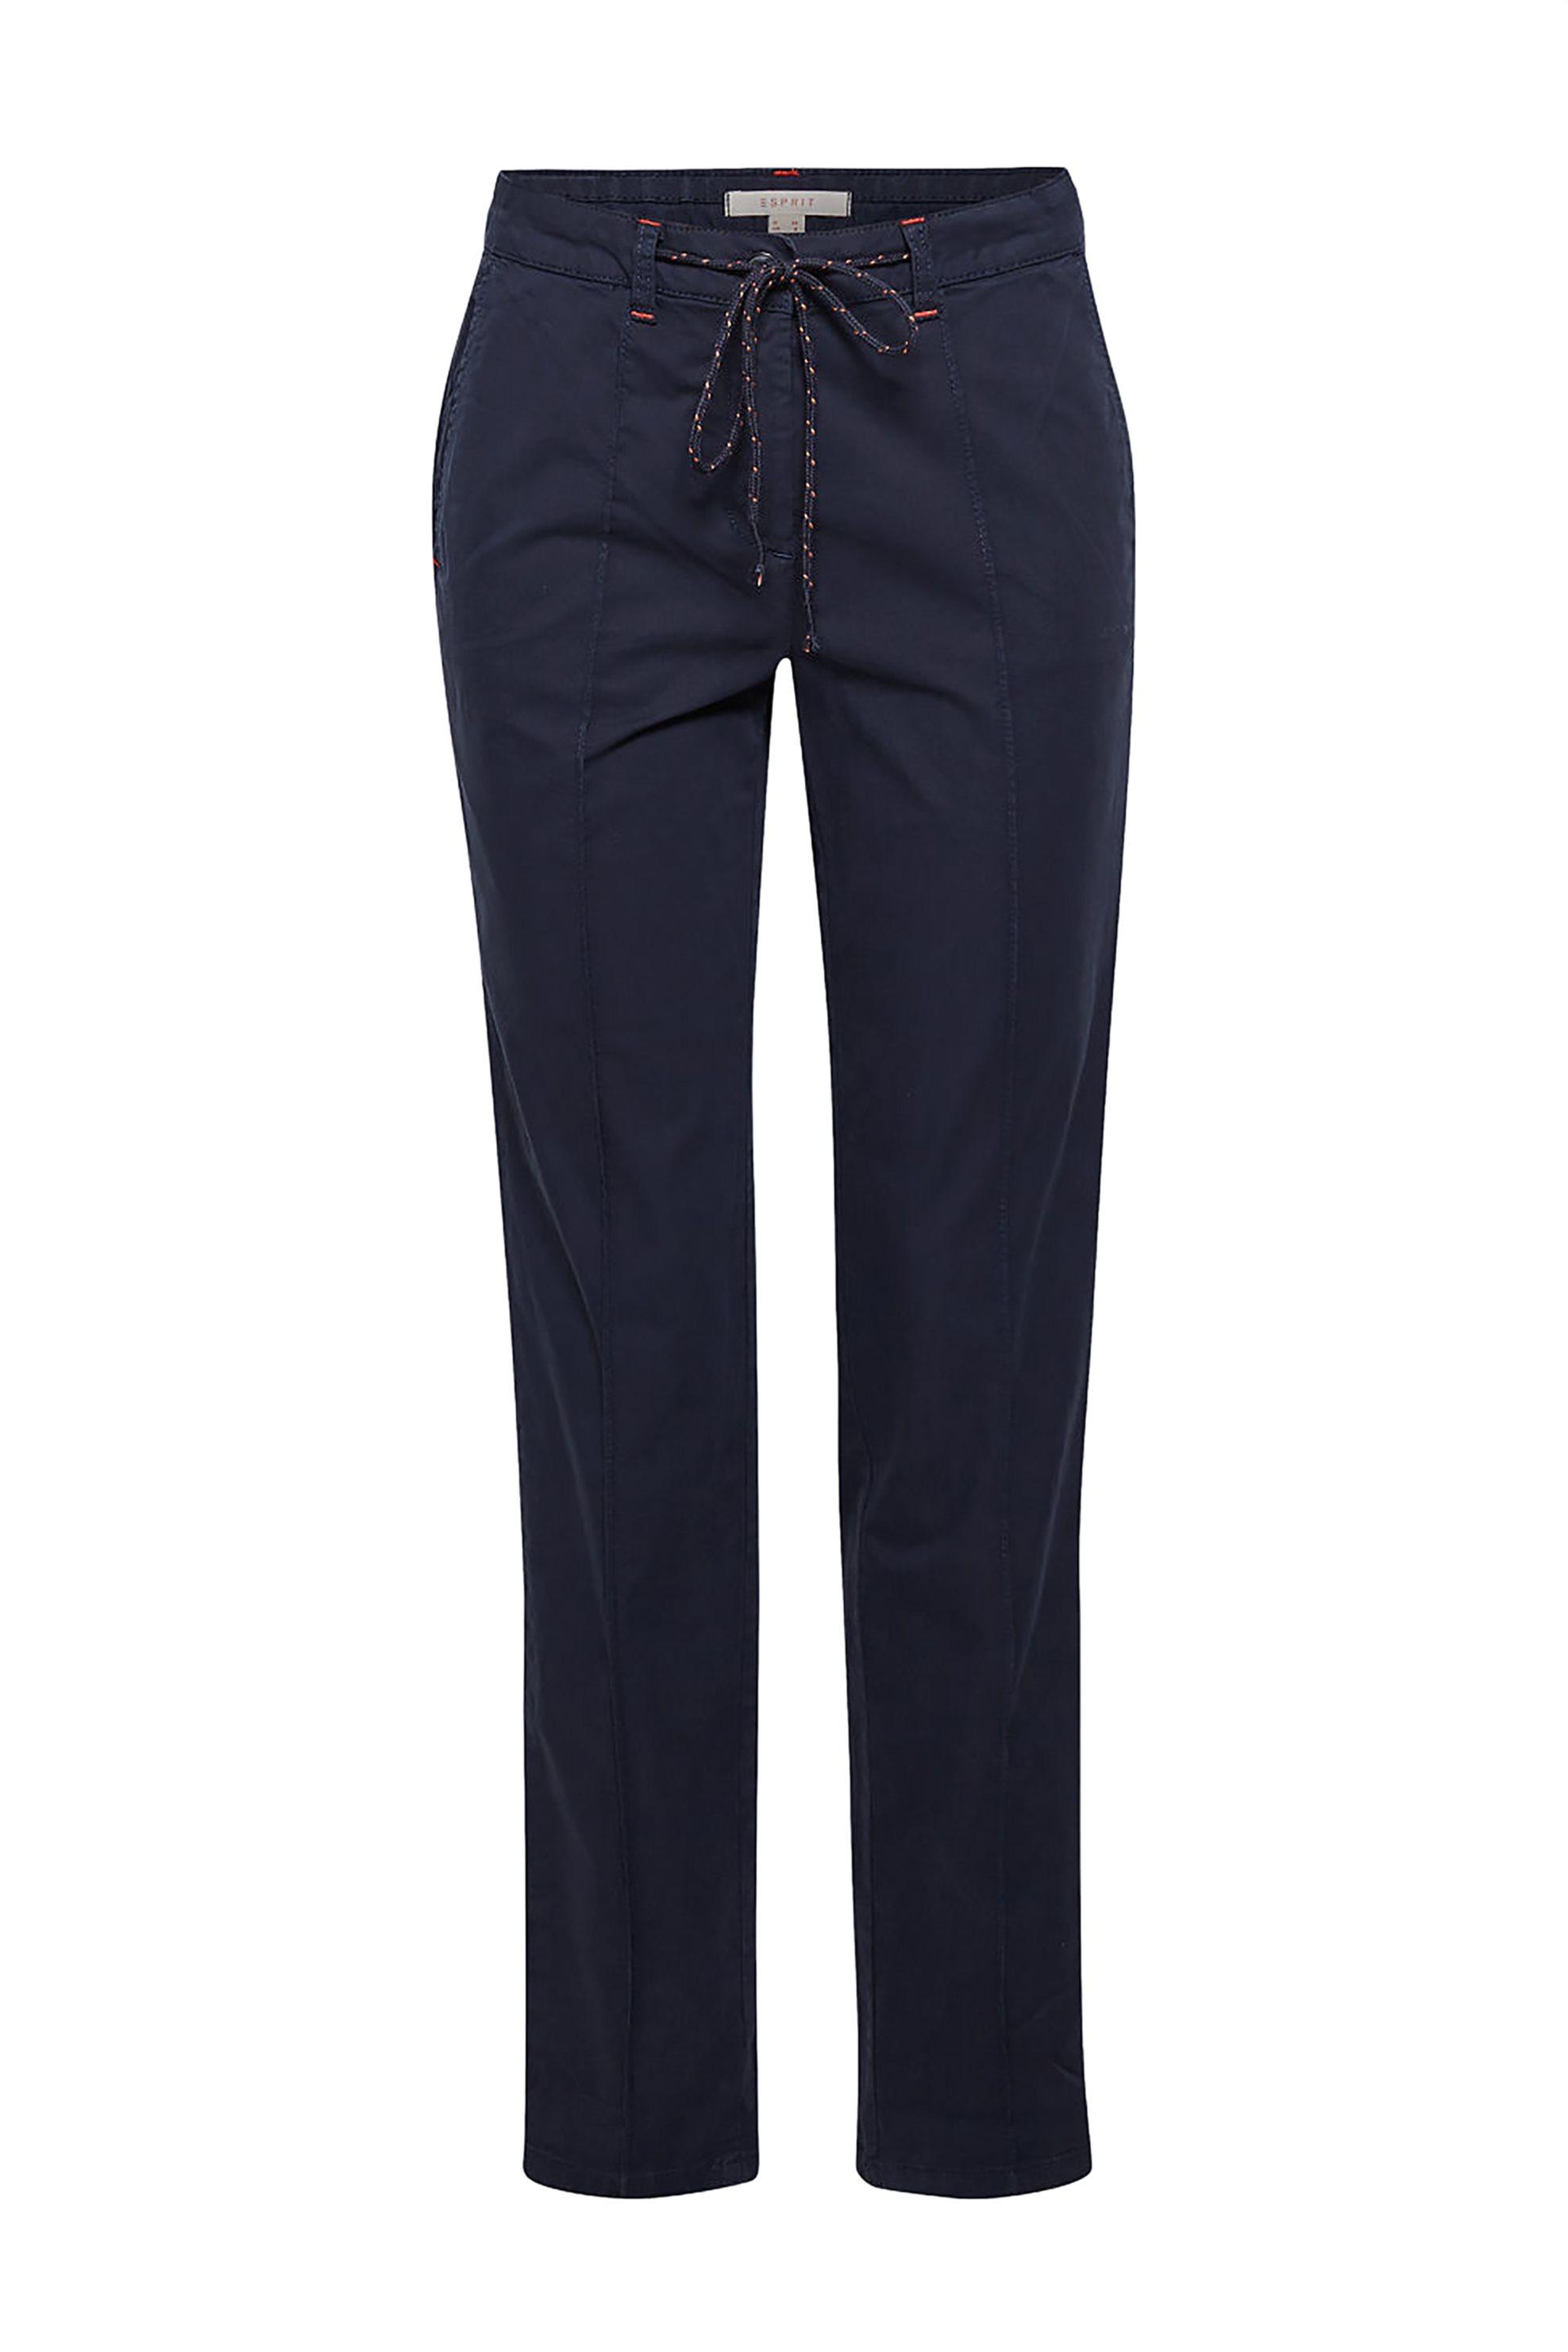 Esprit γυναικείο παντελόνι chinos με κορδόνι στην μέση - 029EE1B032 - Μπλε Σκούρ γυναικα   ρουχα   παντελόνια   chinos